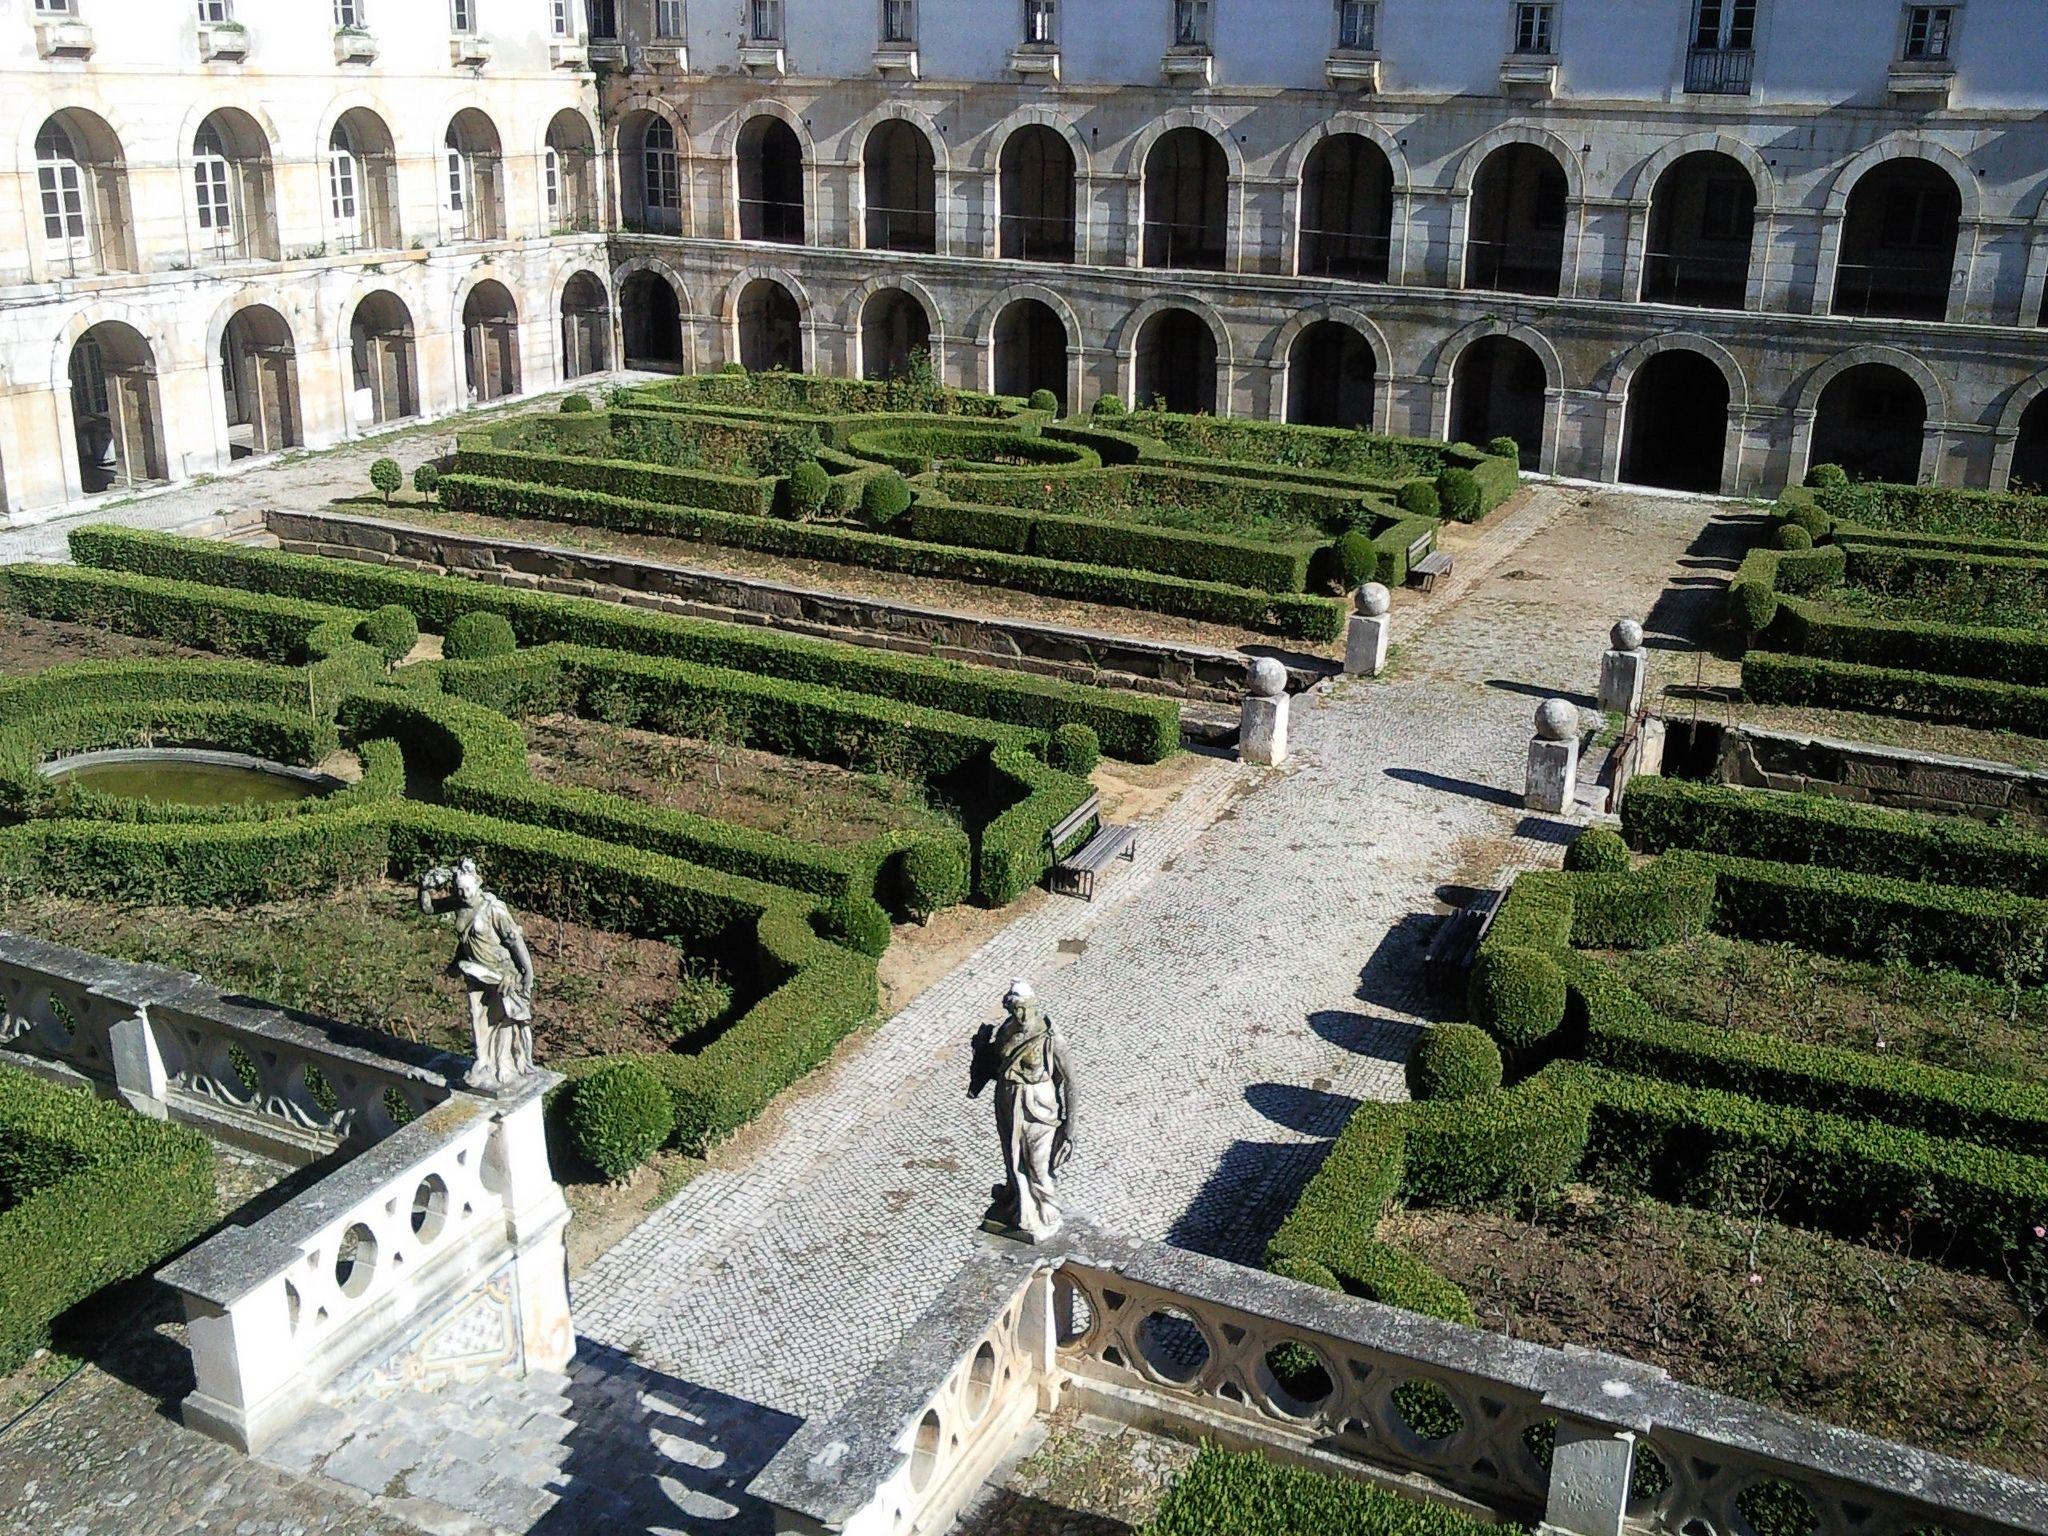 https://flic.kr/p/dtqucs | Monastery of Alcobaça